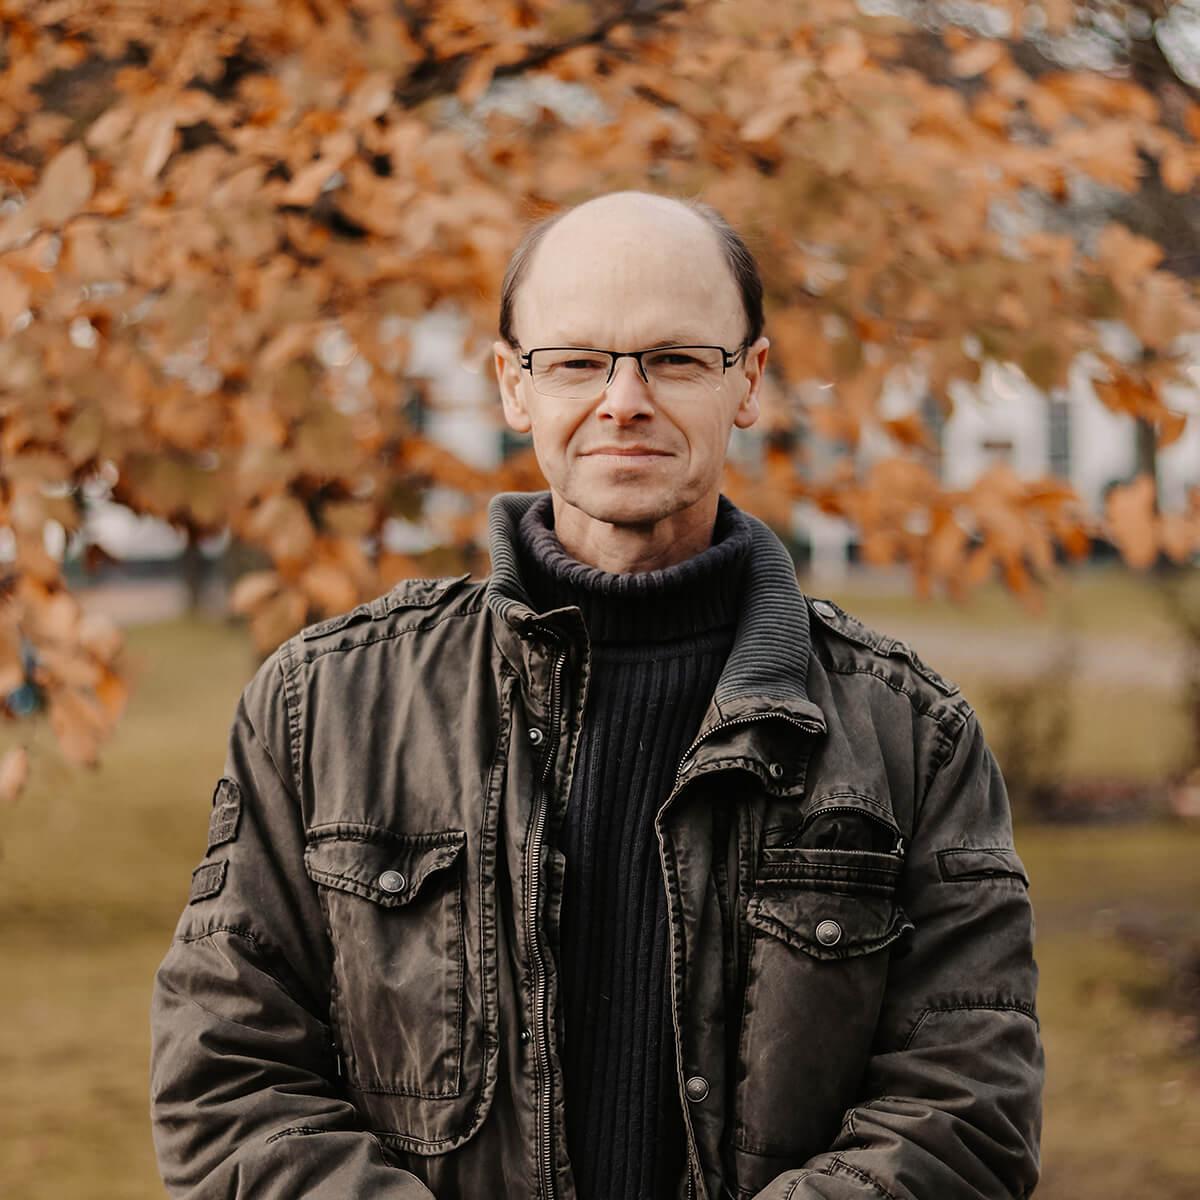 Claus Thiessen, KGR